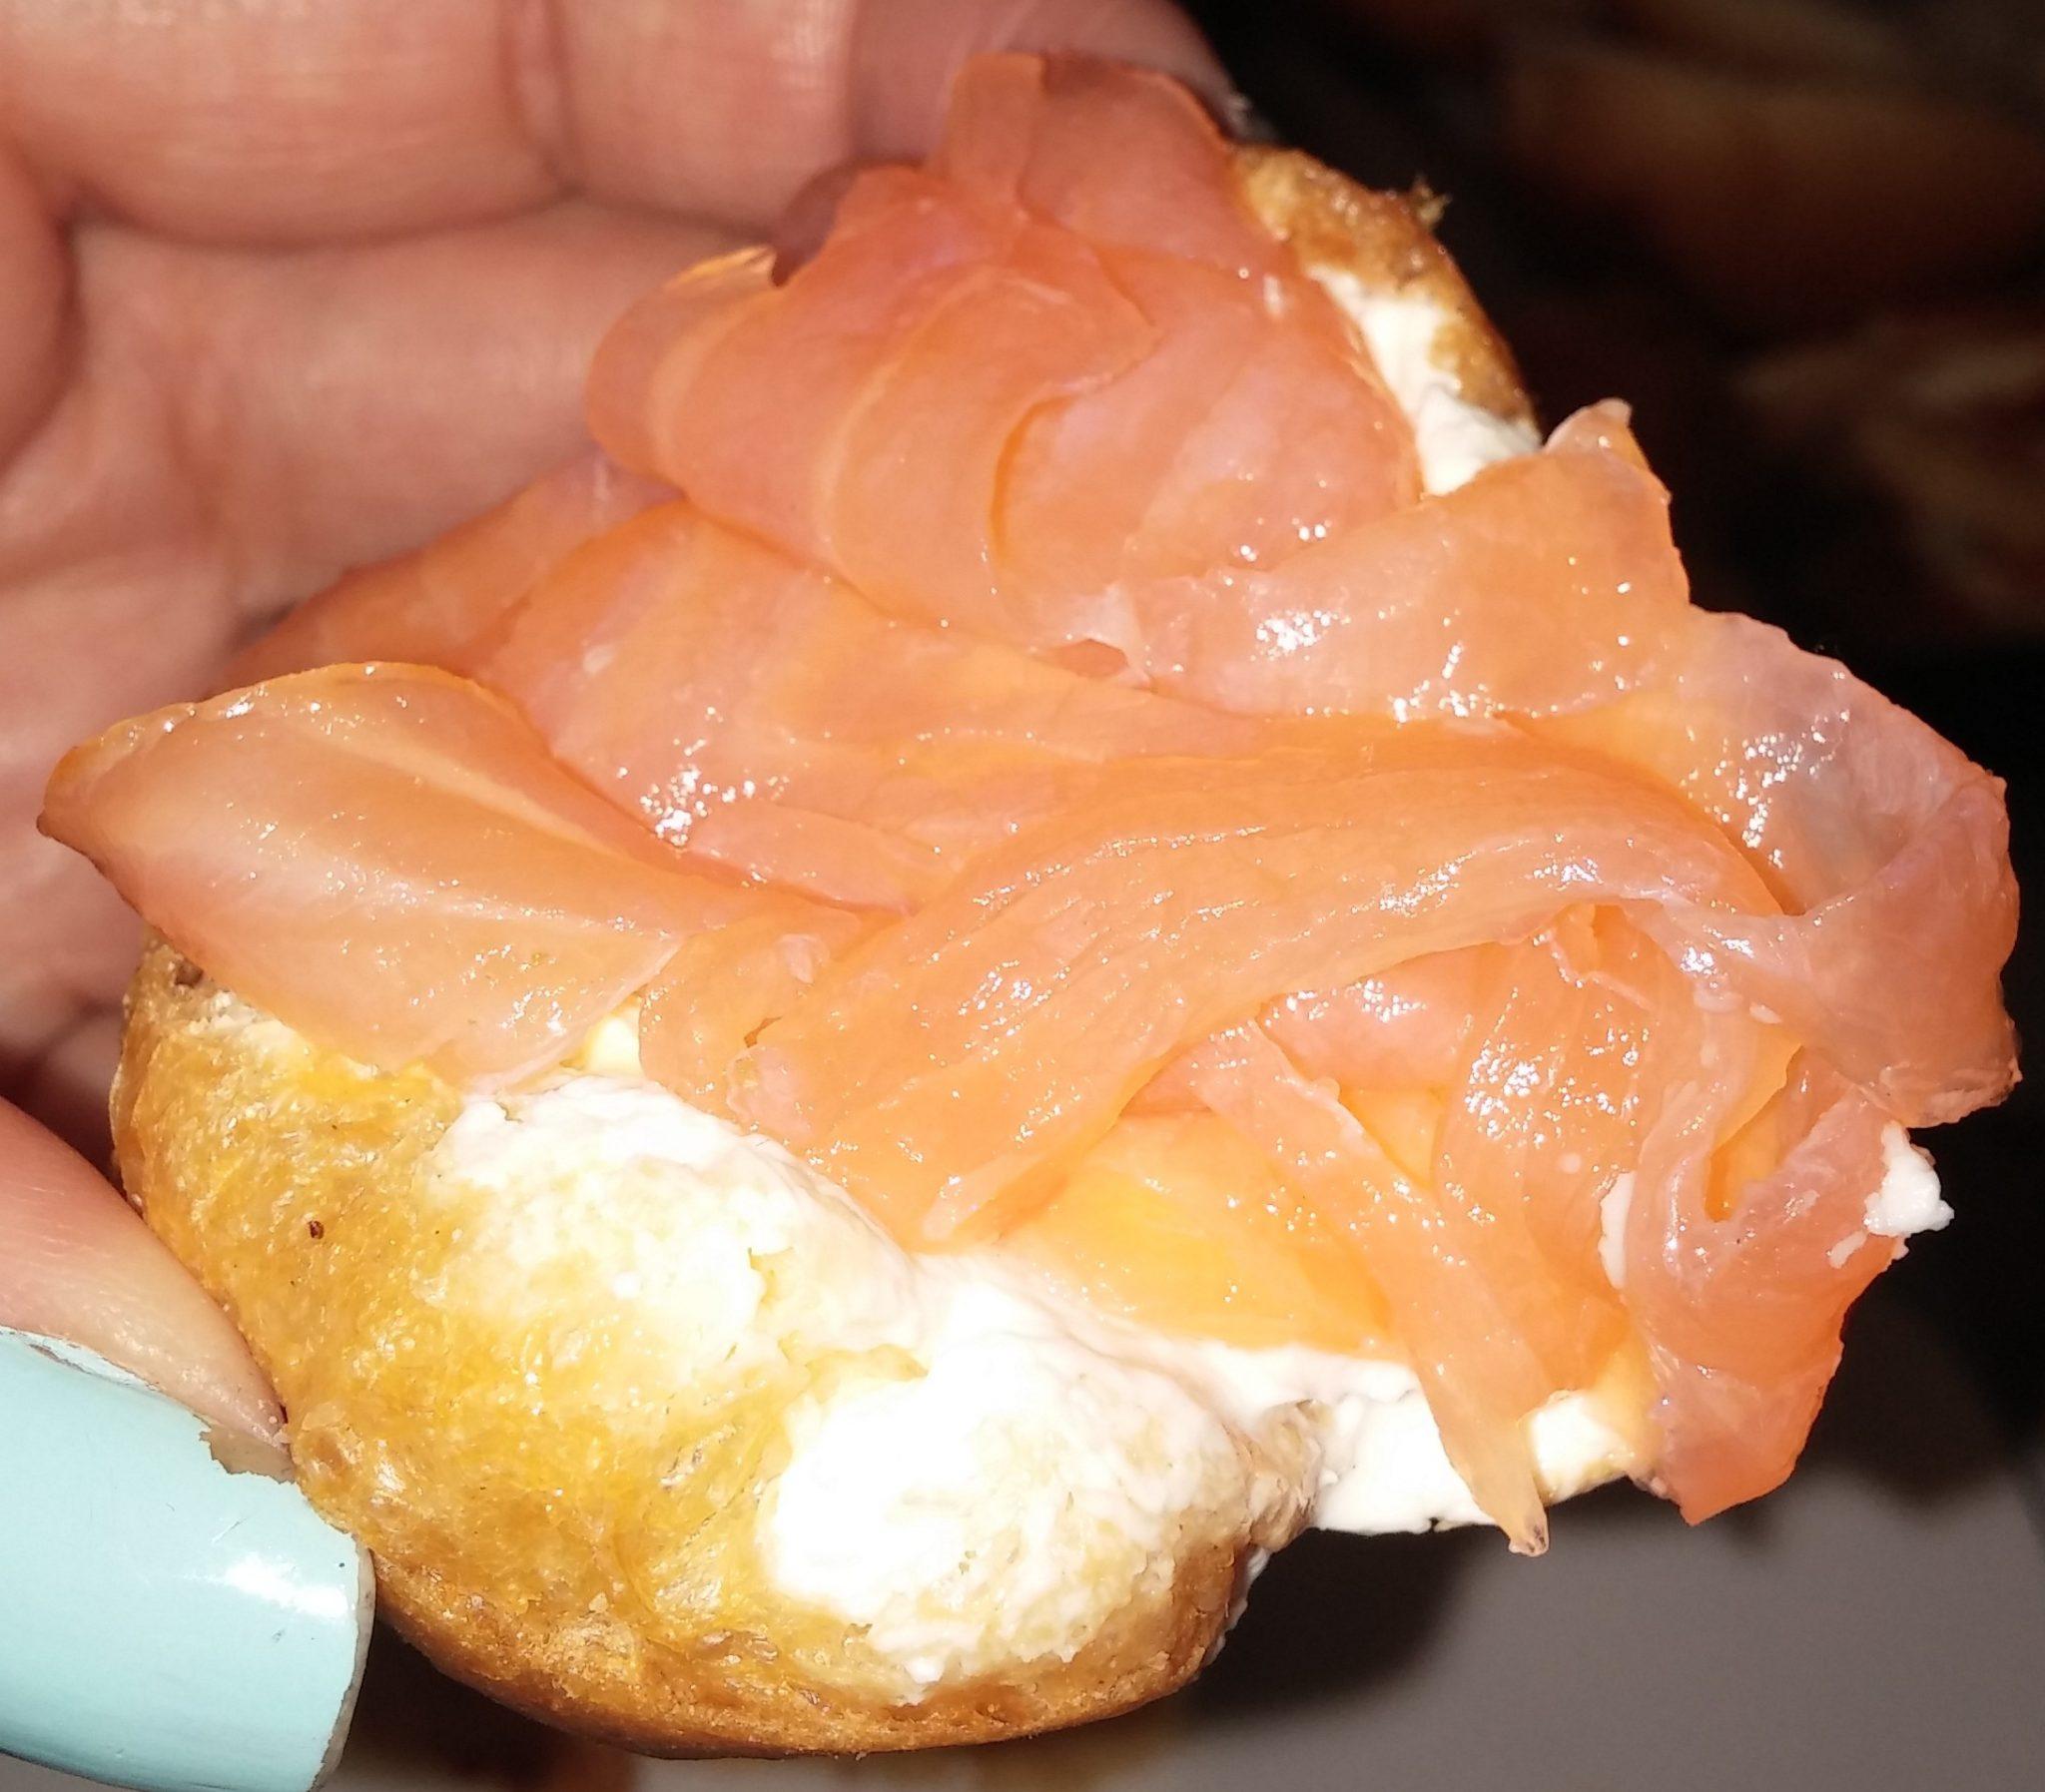 _Slattery smoked salmon